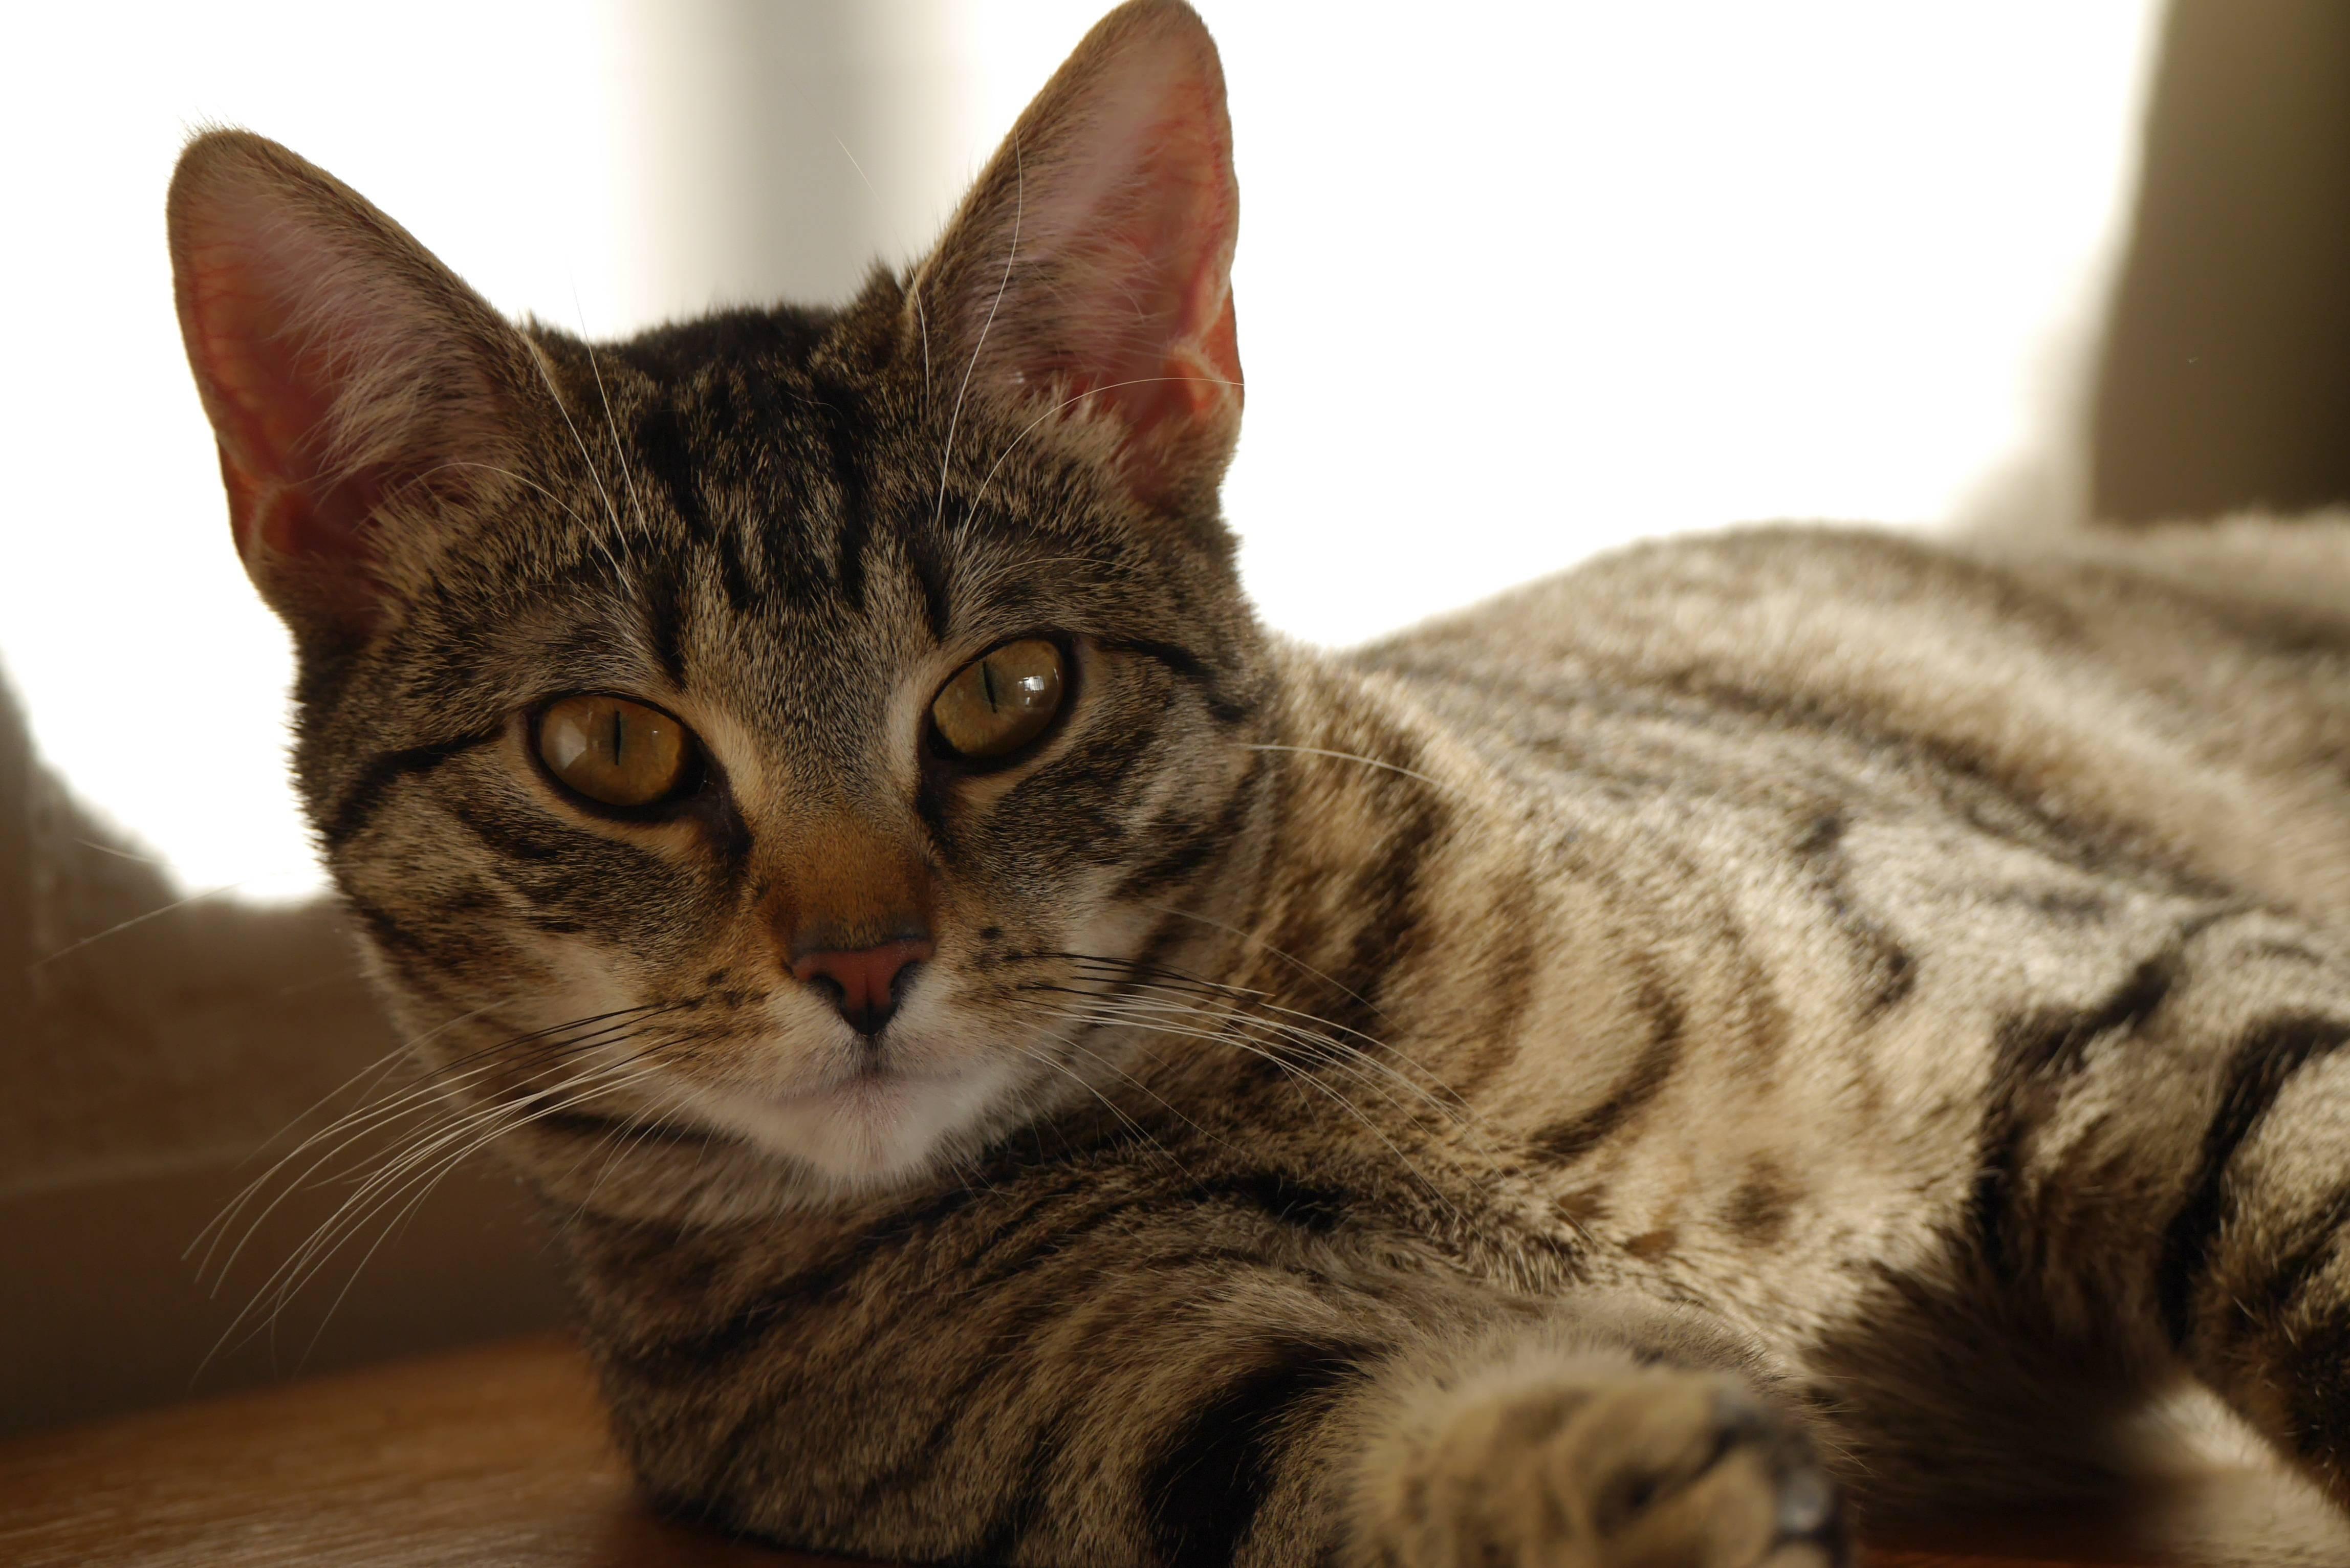 Азиатская табби: фото кошки, цена, характер породы, описание, видео азиатская табби: фото кошки, цена, характер породы, описание, видео